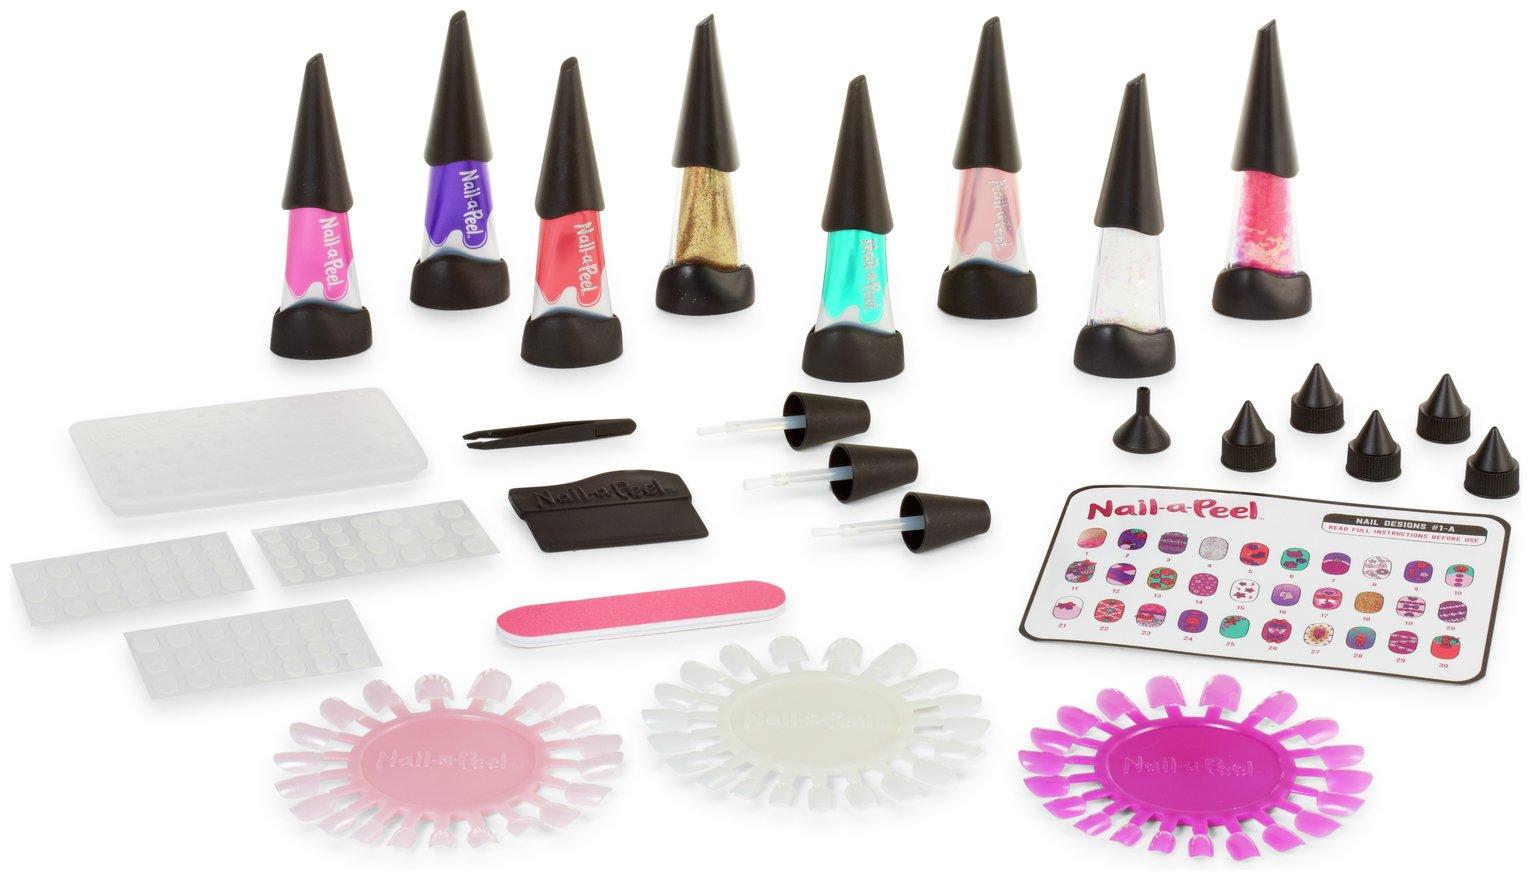 Nail-a-Peel Deluxe Colour Kit